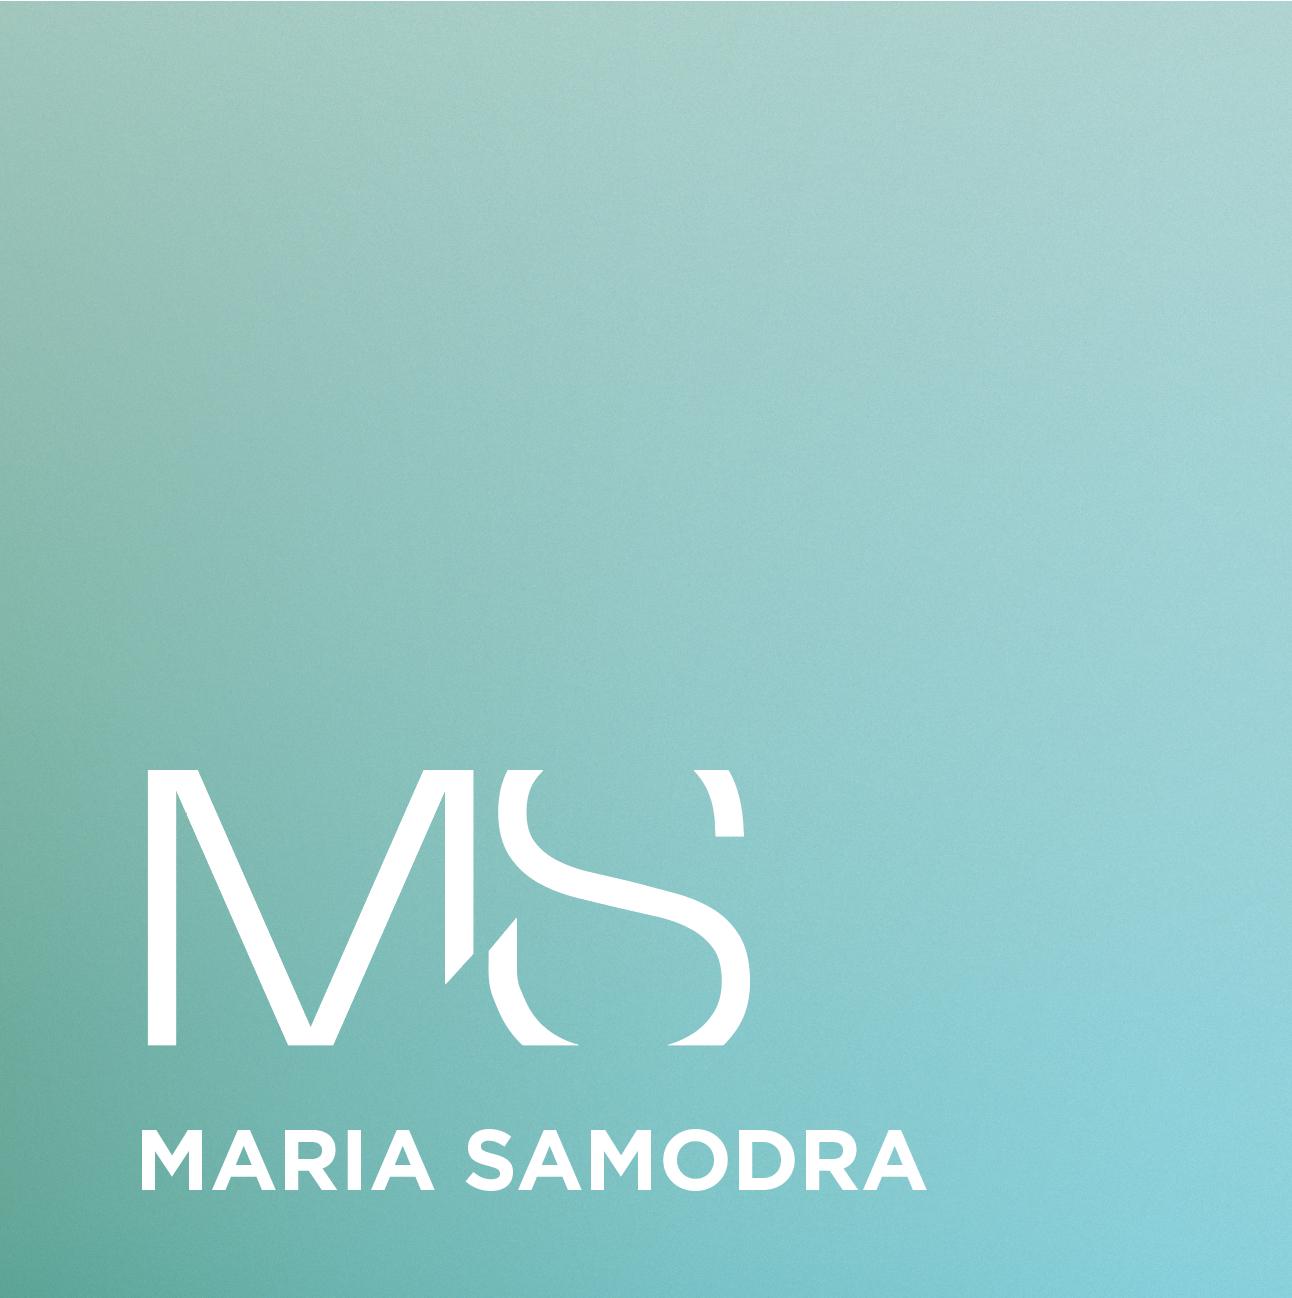 Maria Samodra